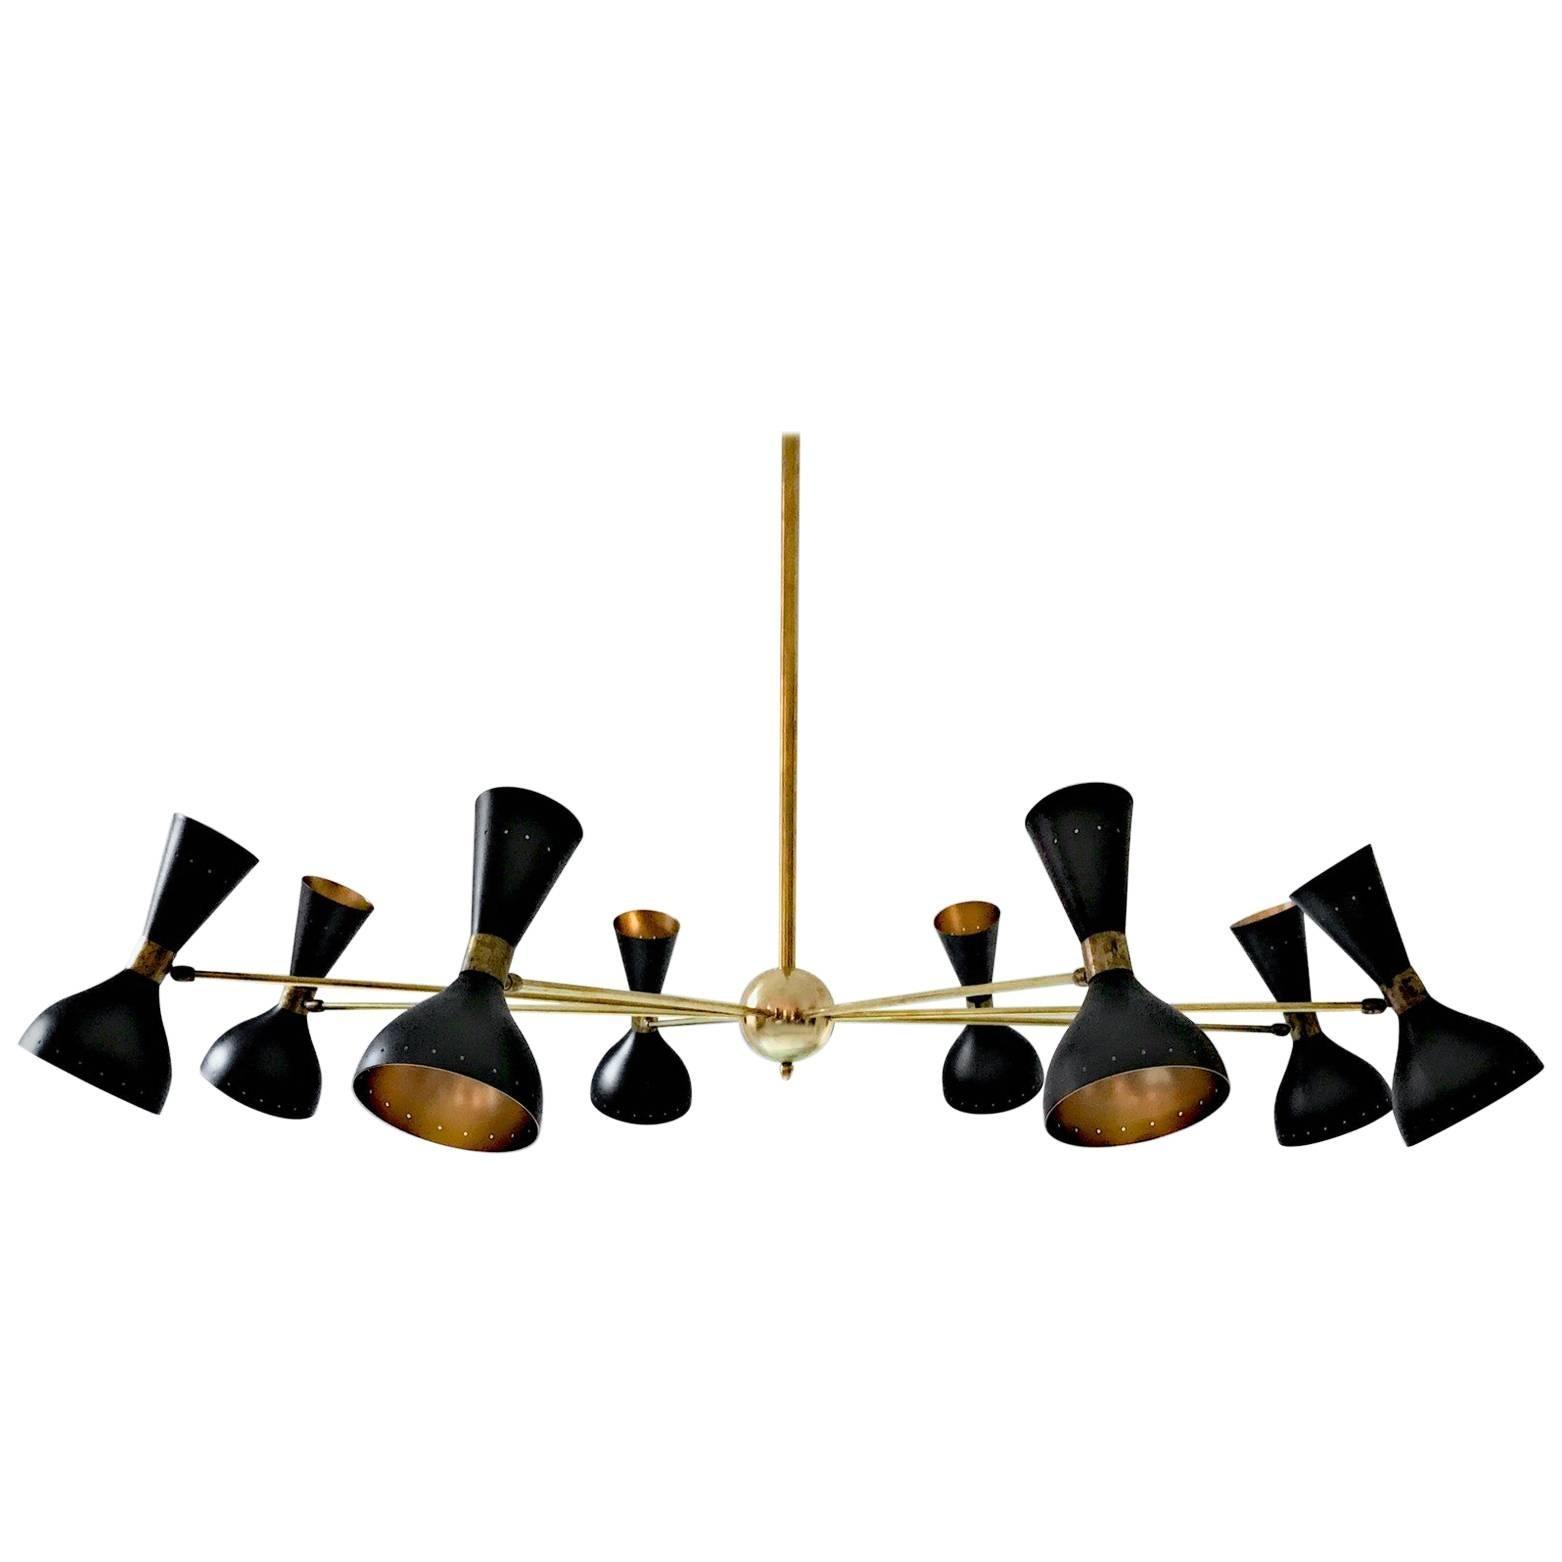 Eight-Arm Brass Chandelier, Ivory or Black Heads, Gold Inside in Stilnovo Style